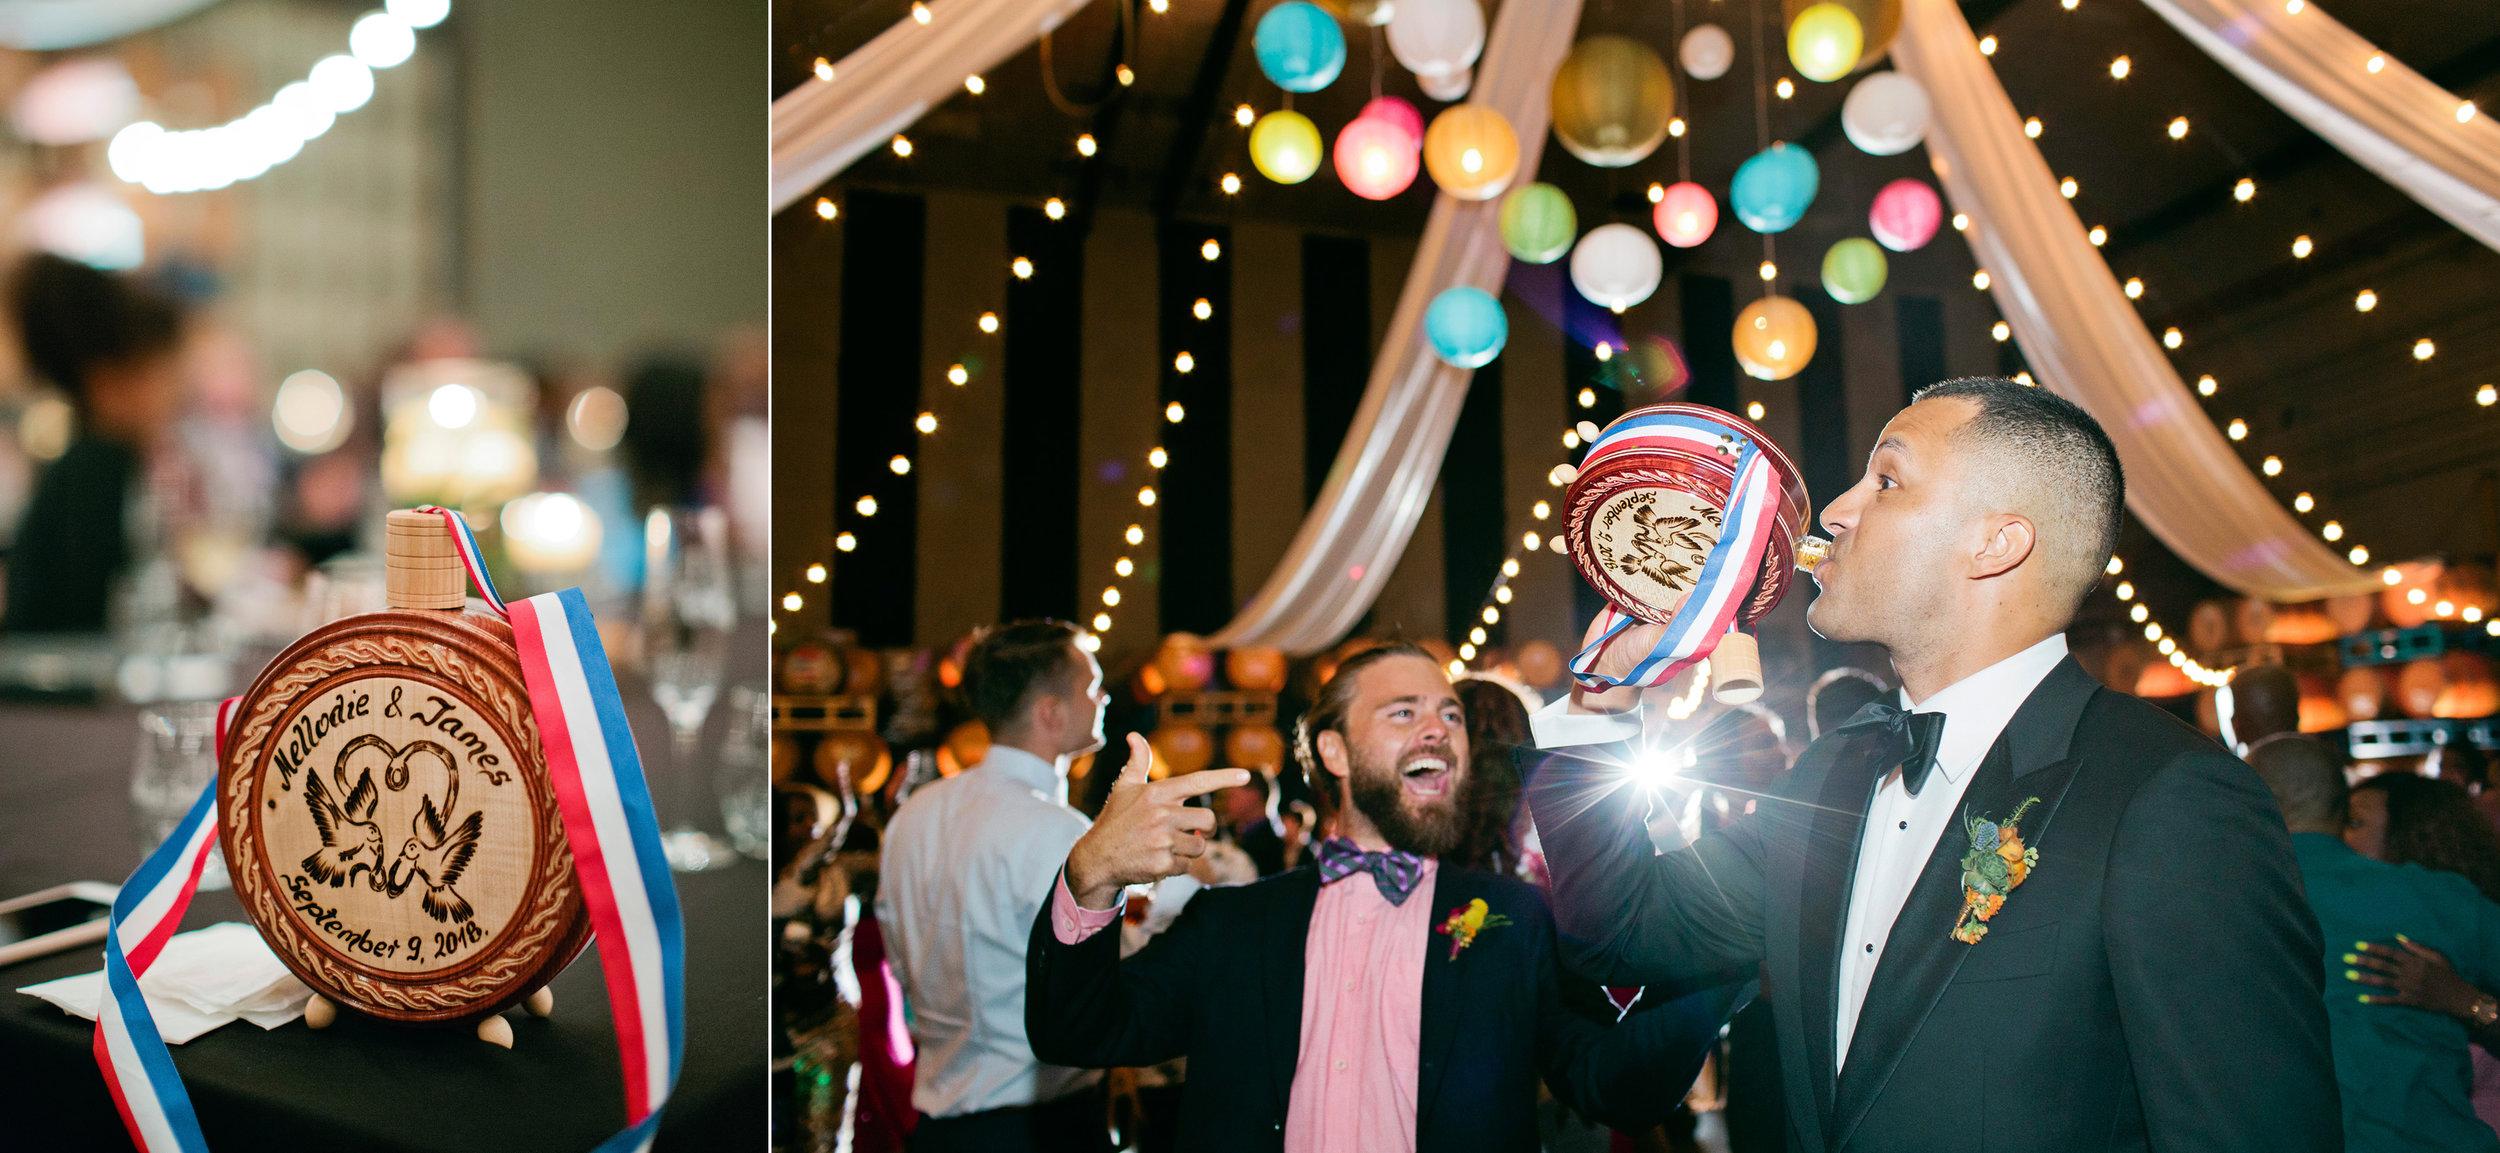 Alameda-Rockwall-Winery-Wedding-056 copy.jpg